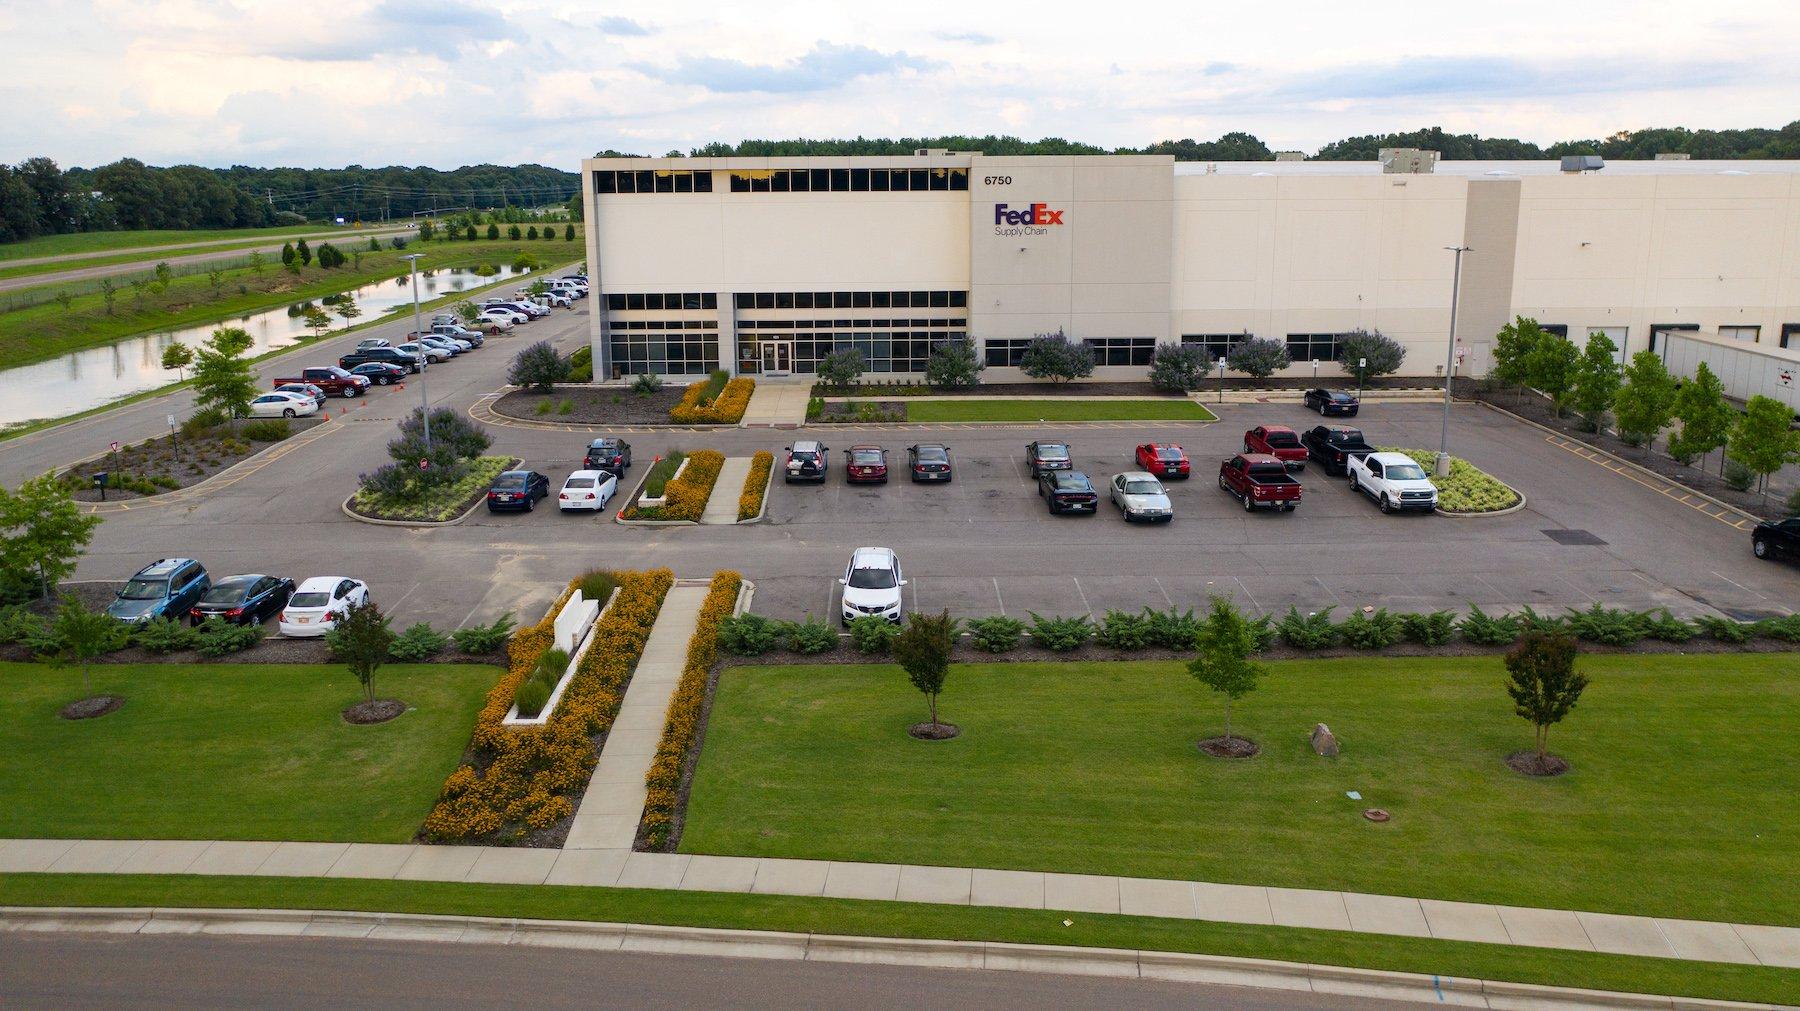 FedEx Warehouse mowing site